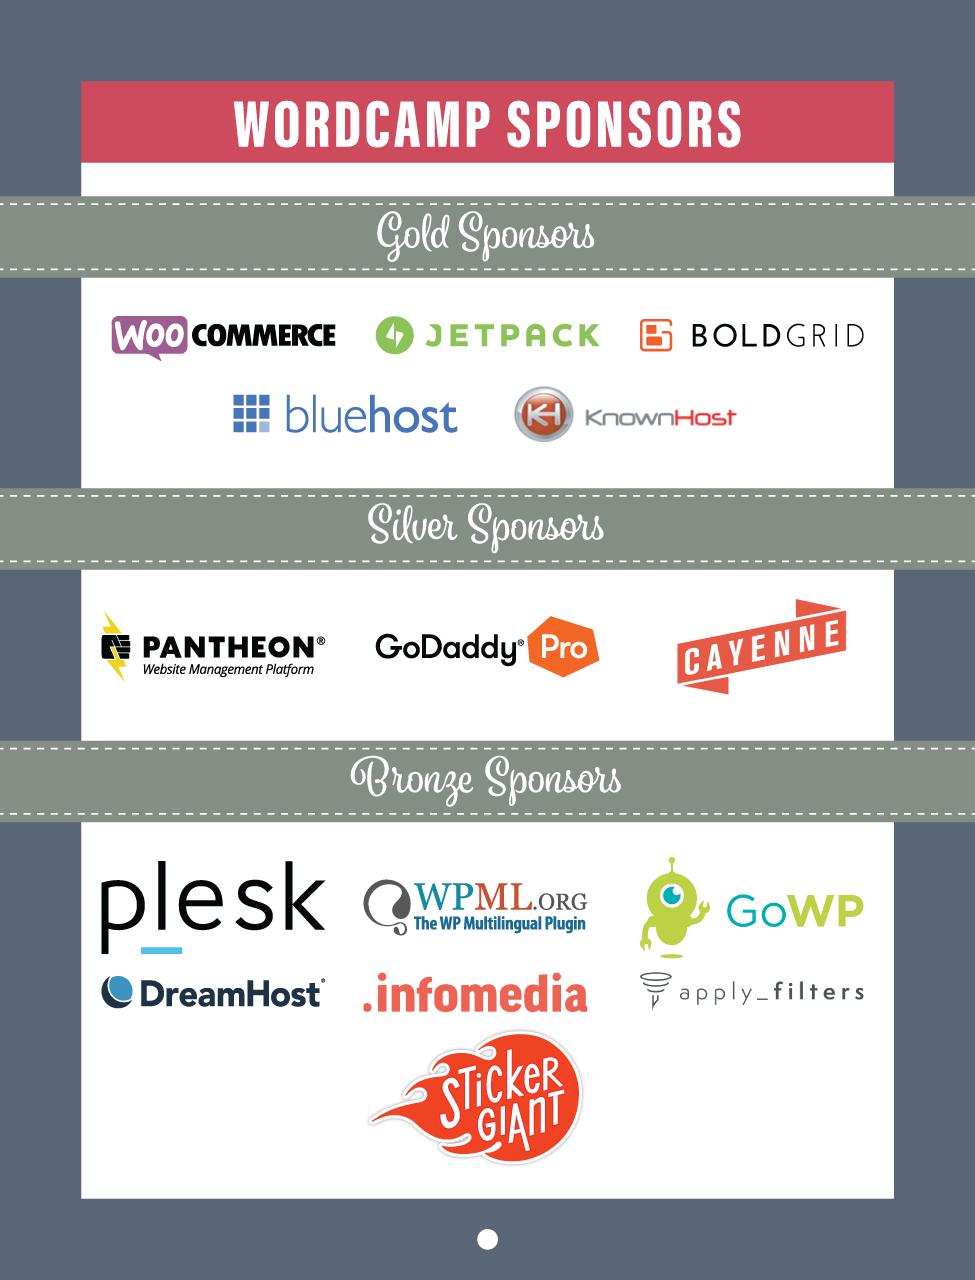 WordCamp Sponsors